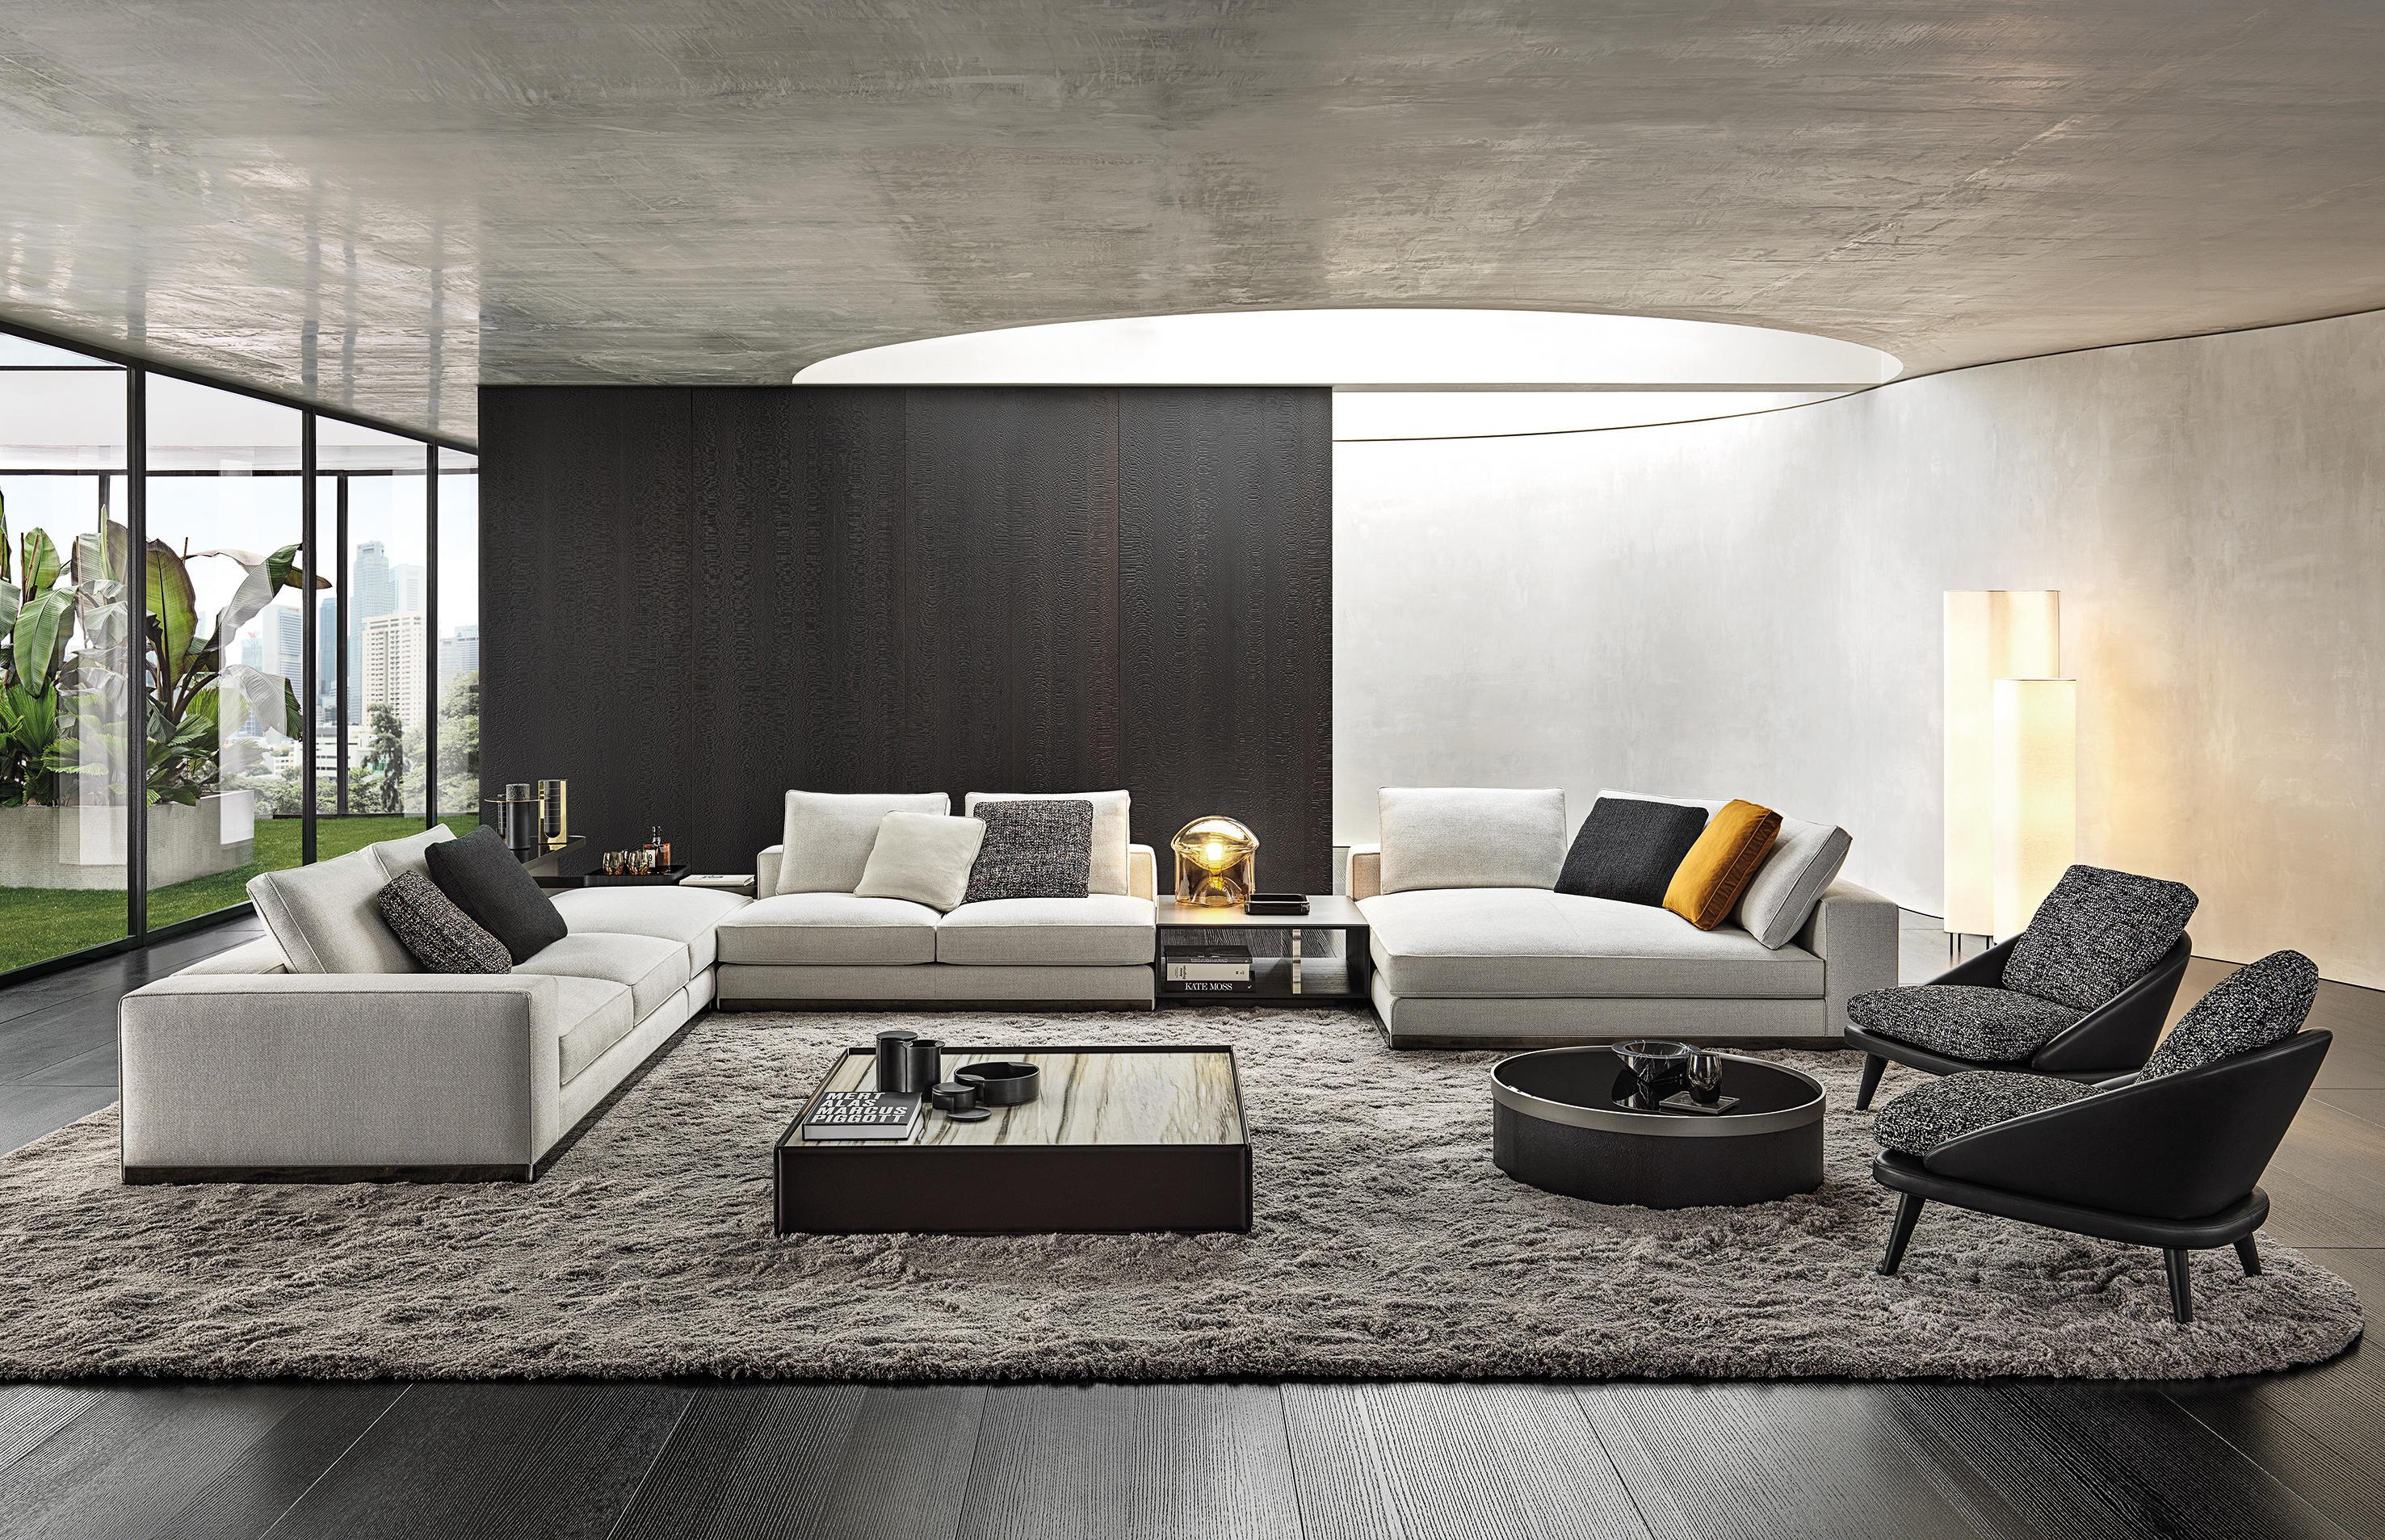 Arredamento Casa Western west - sofas from minotti | architonic